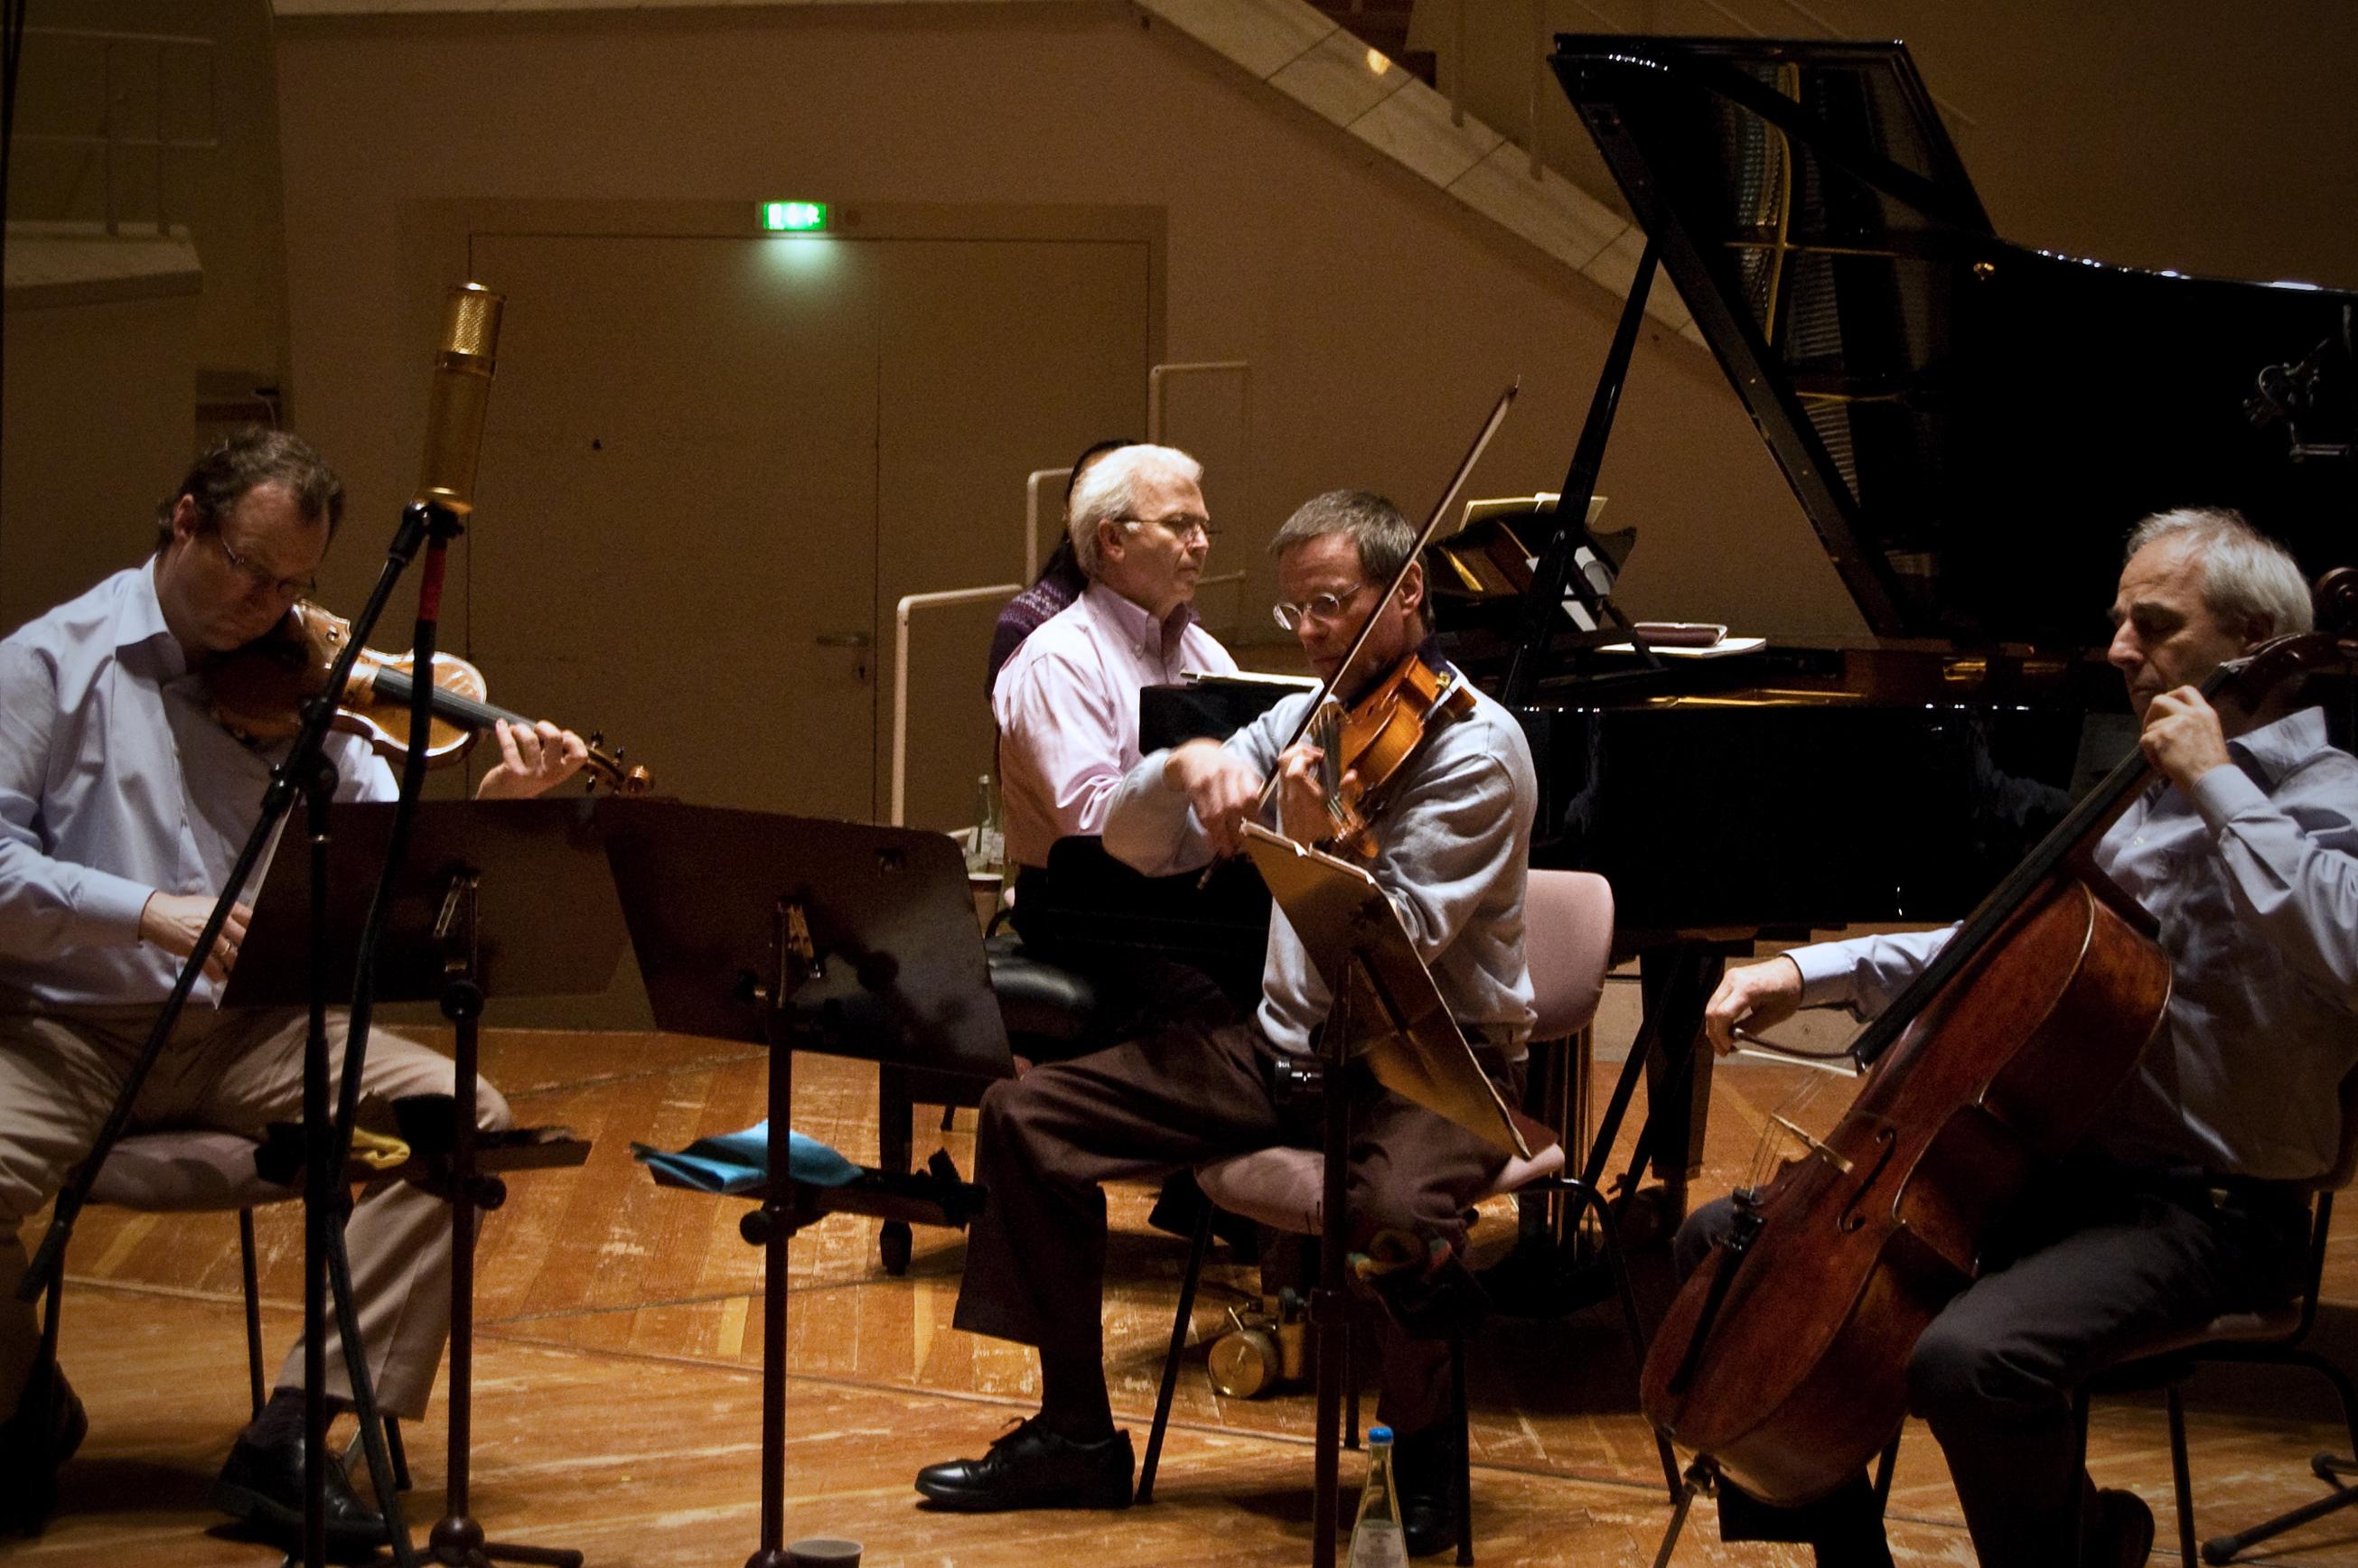 quartett beim spielen.jpg